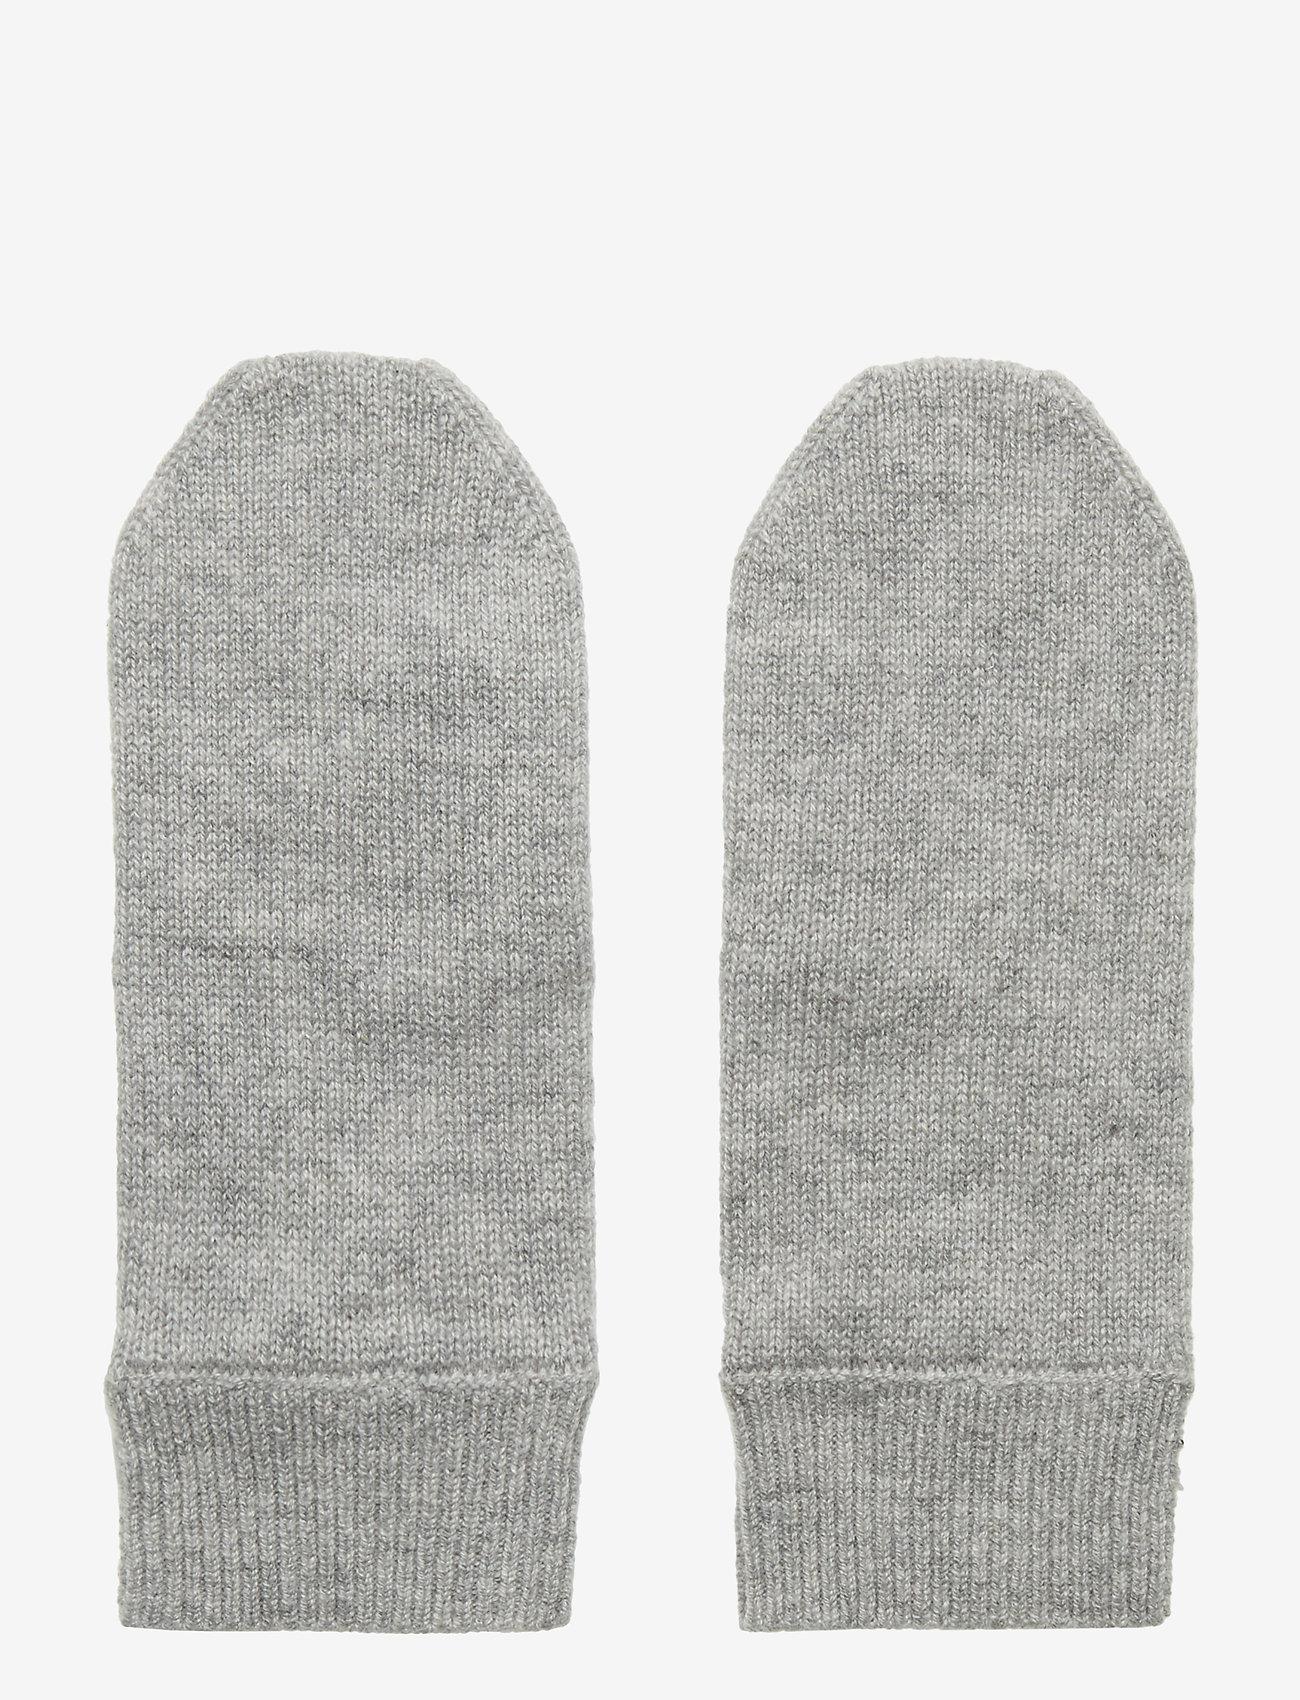 Davida Cashmere - Mittens - accessories - light grey - 0